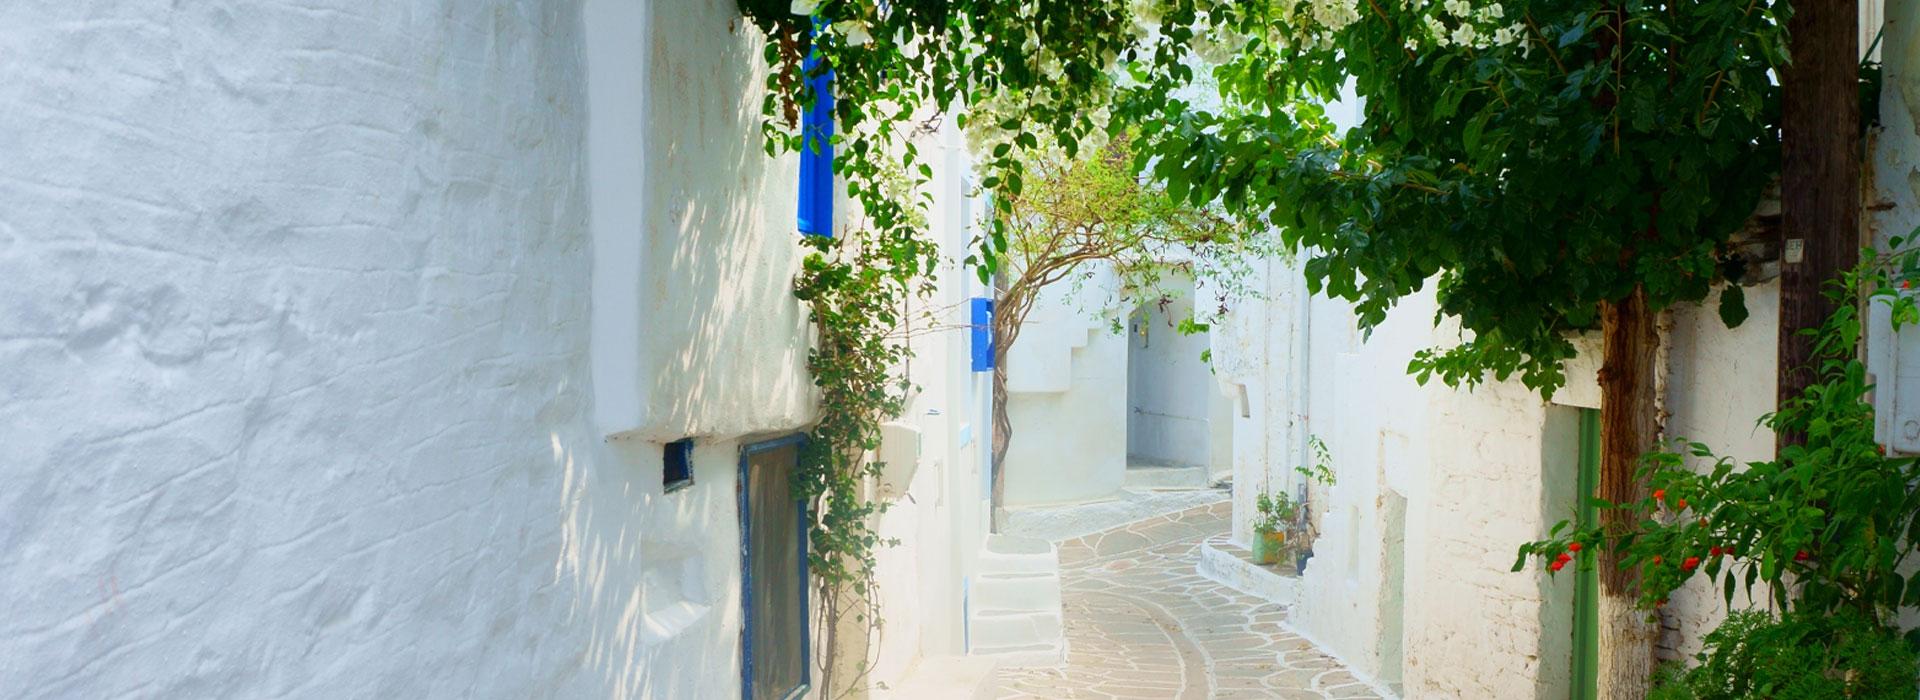 Greece: Literature